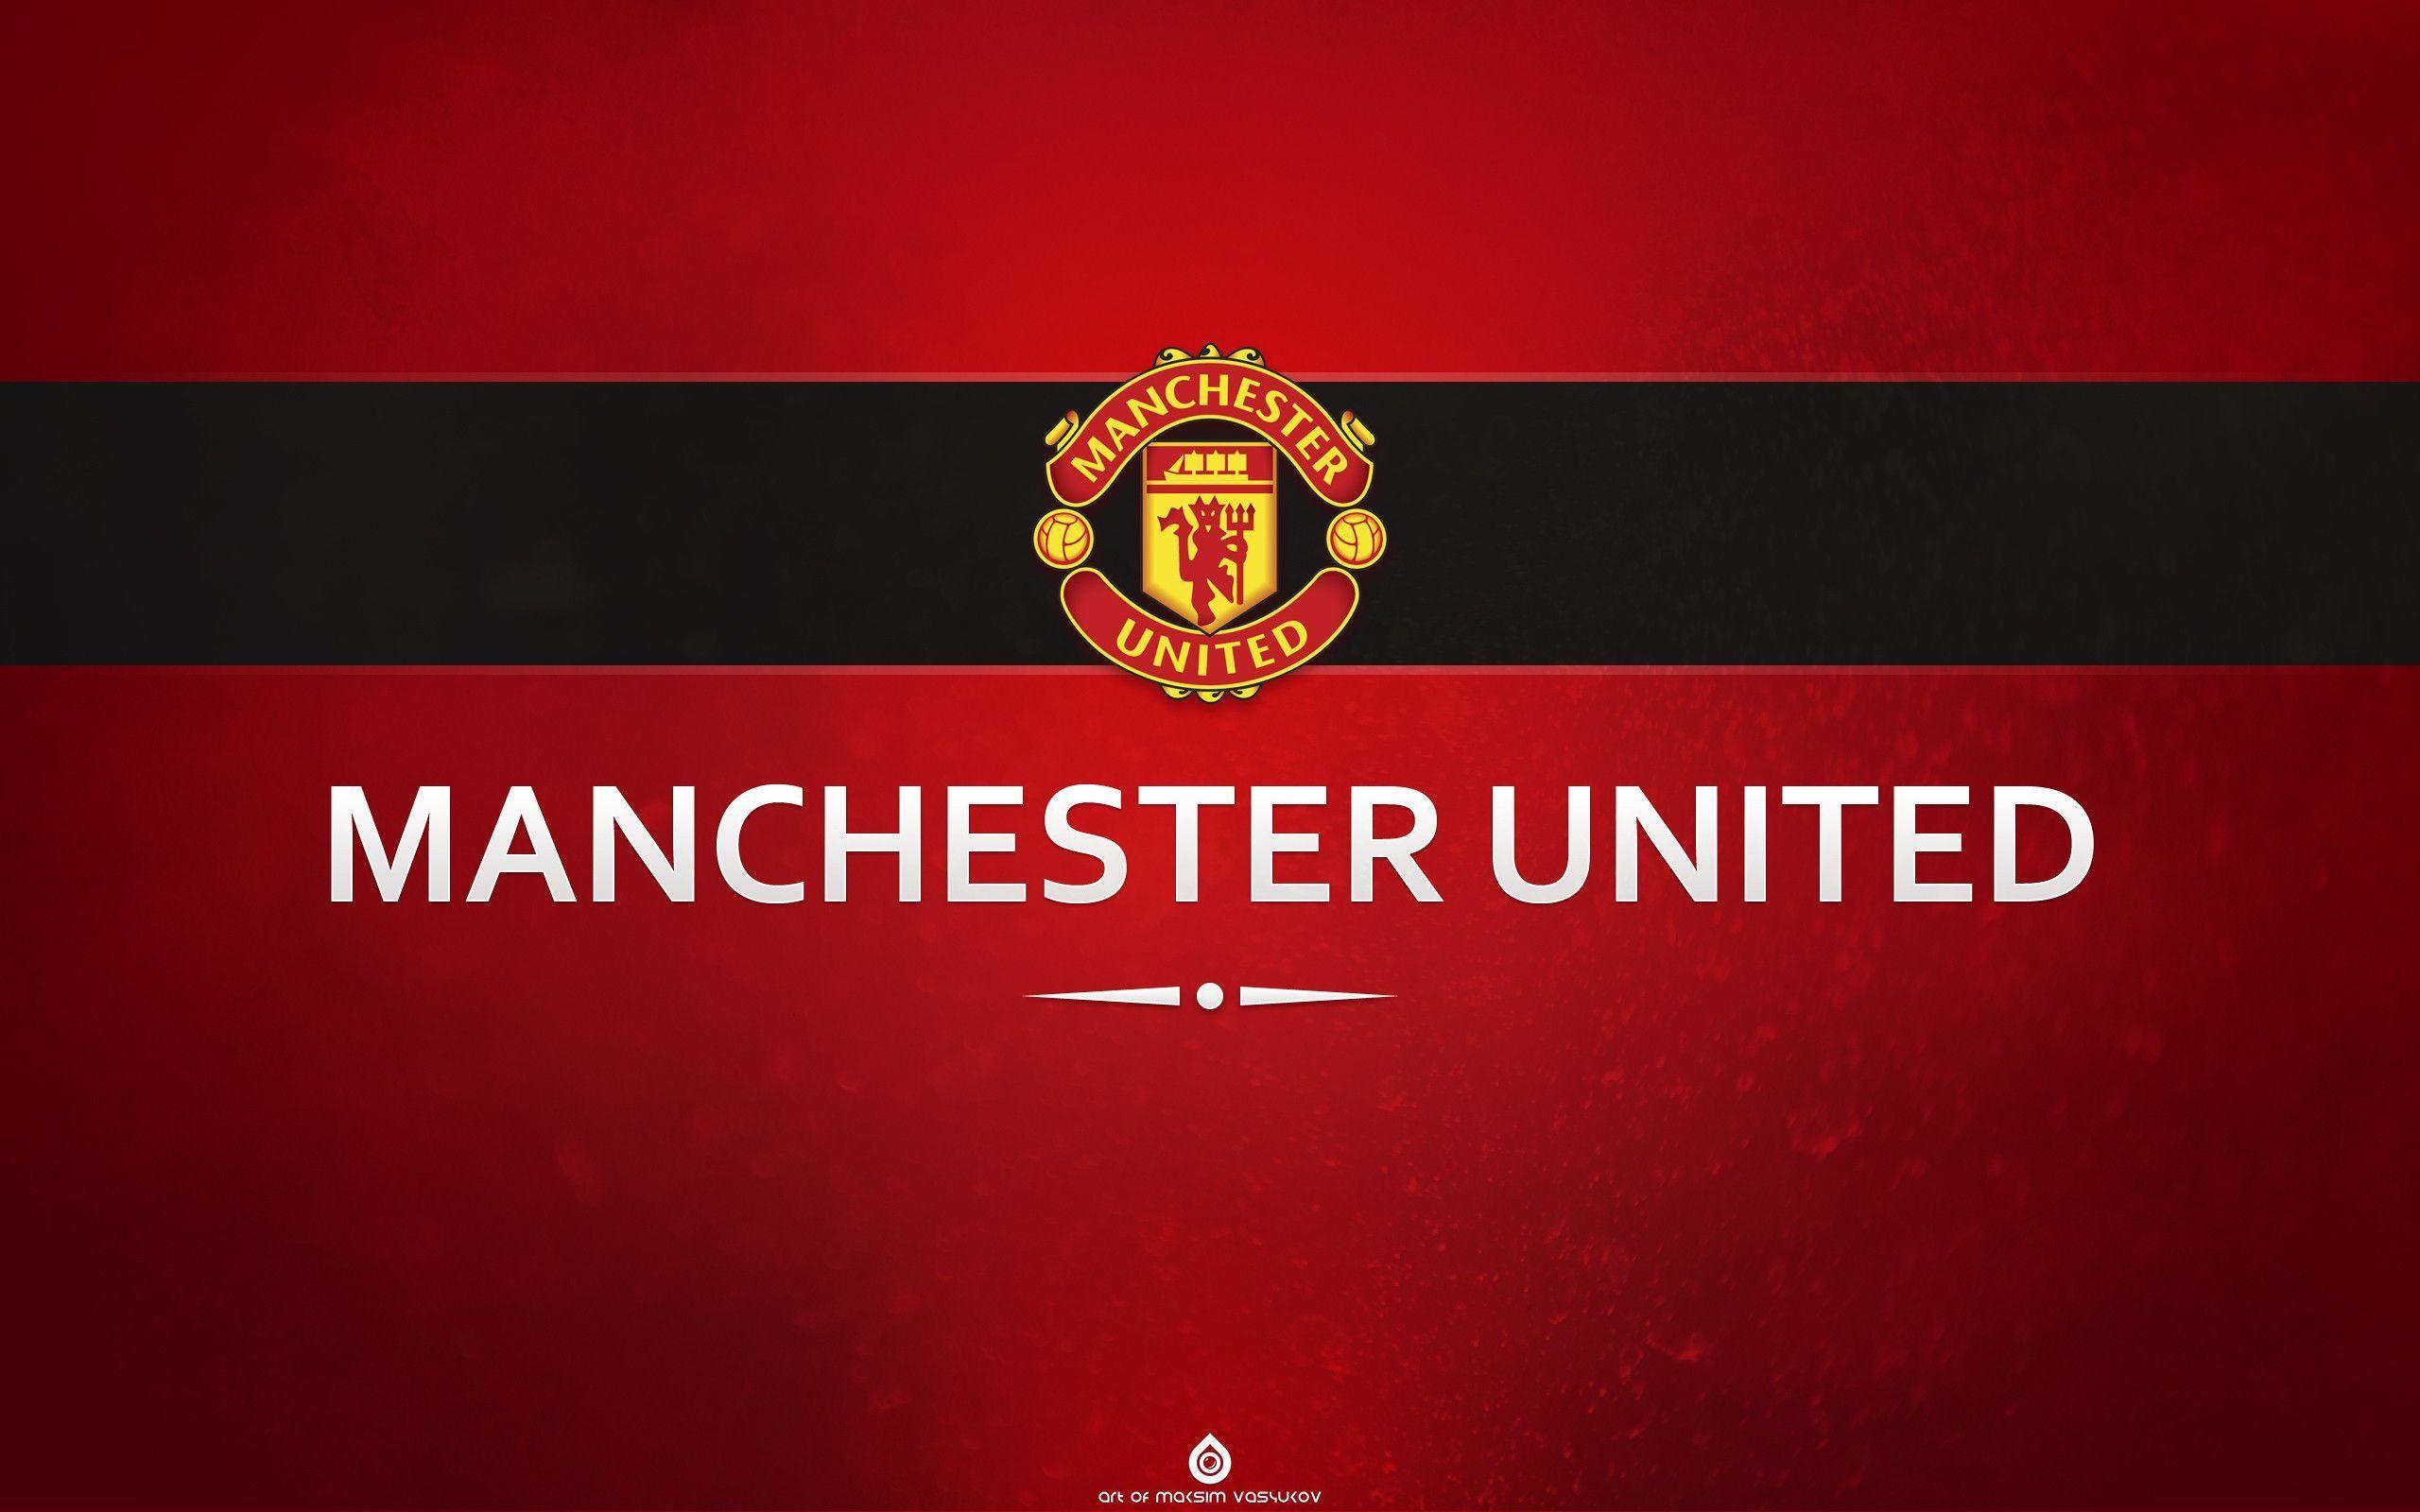 Man Utd Backgrounds 69 Images